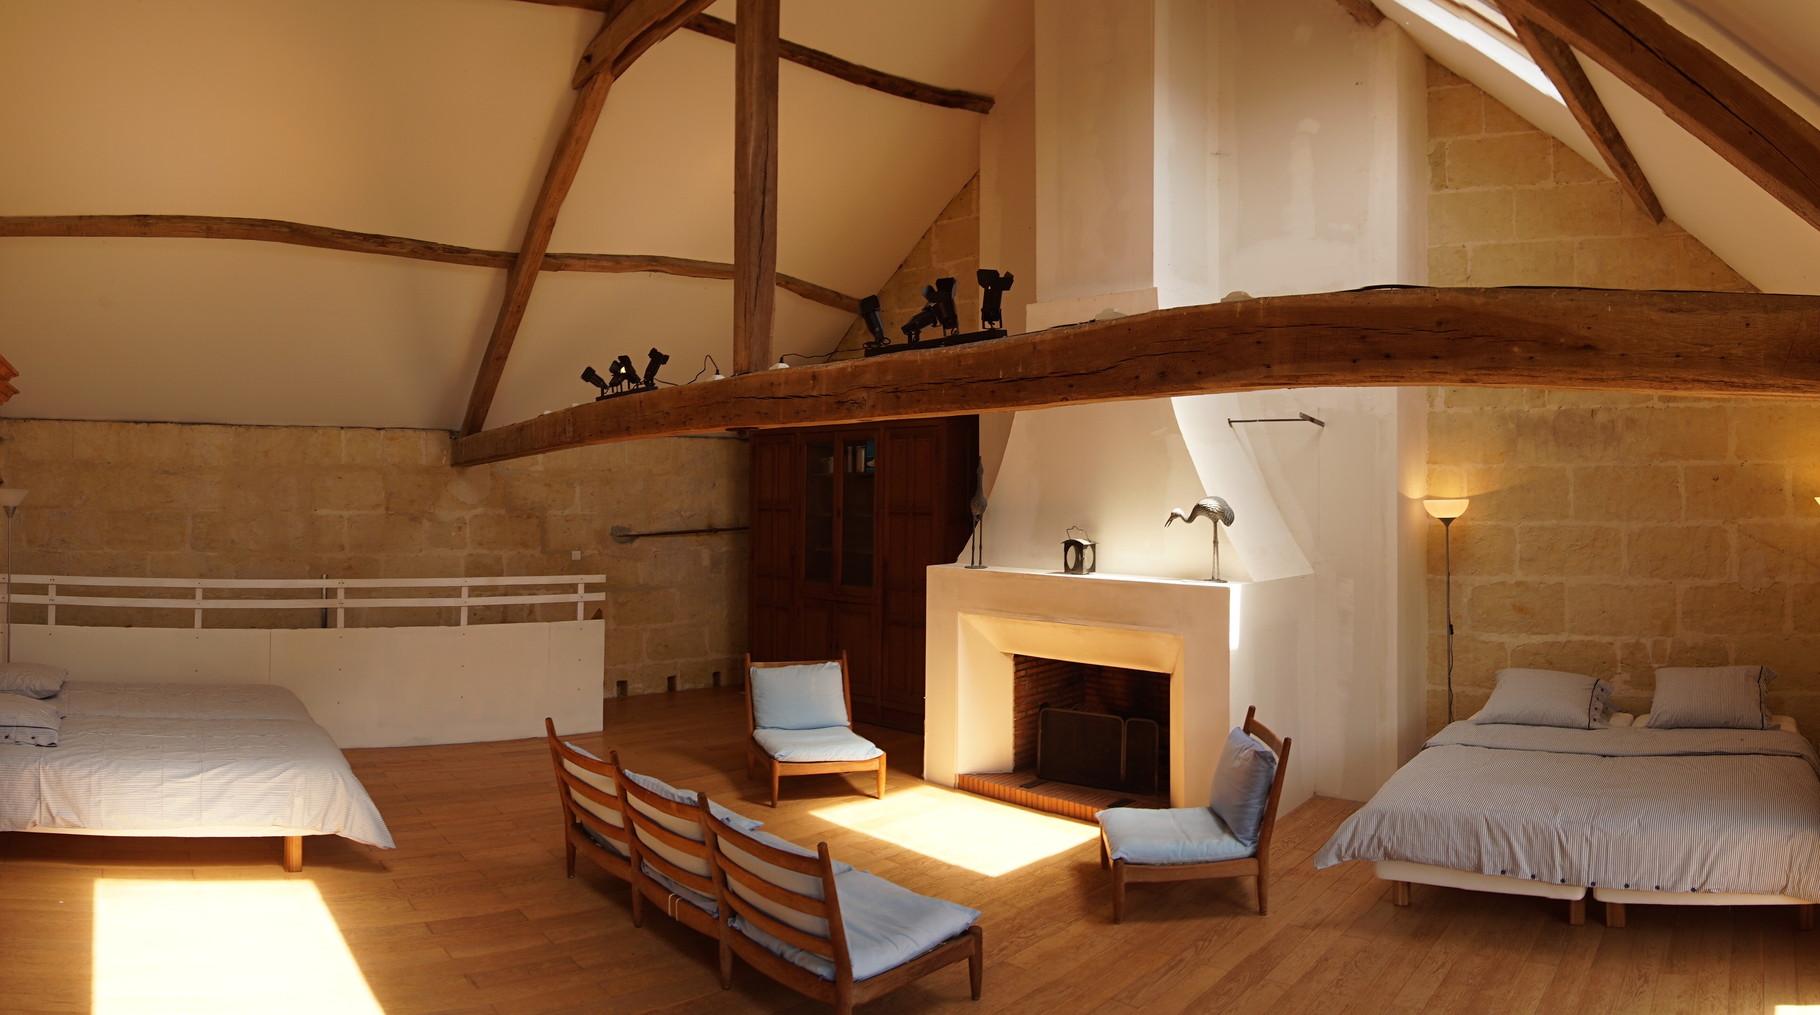 Grande chambre de la grange de la bergerie - Gîte Aisne